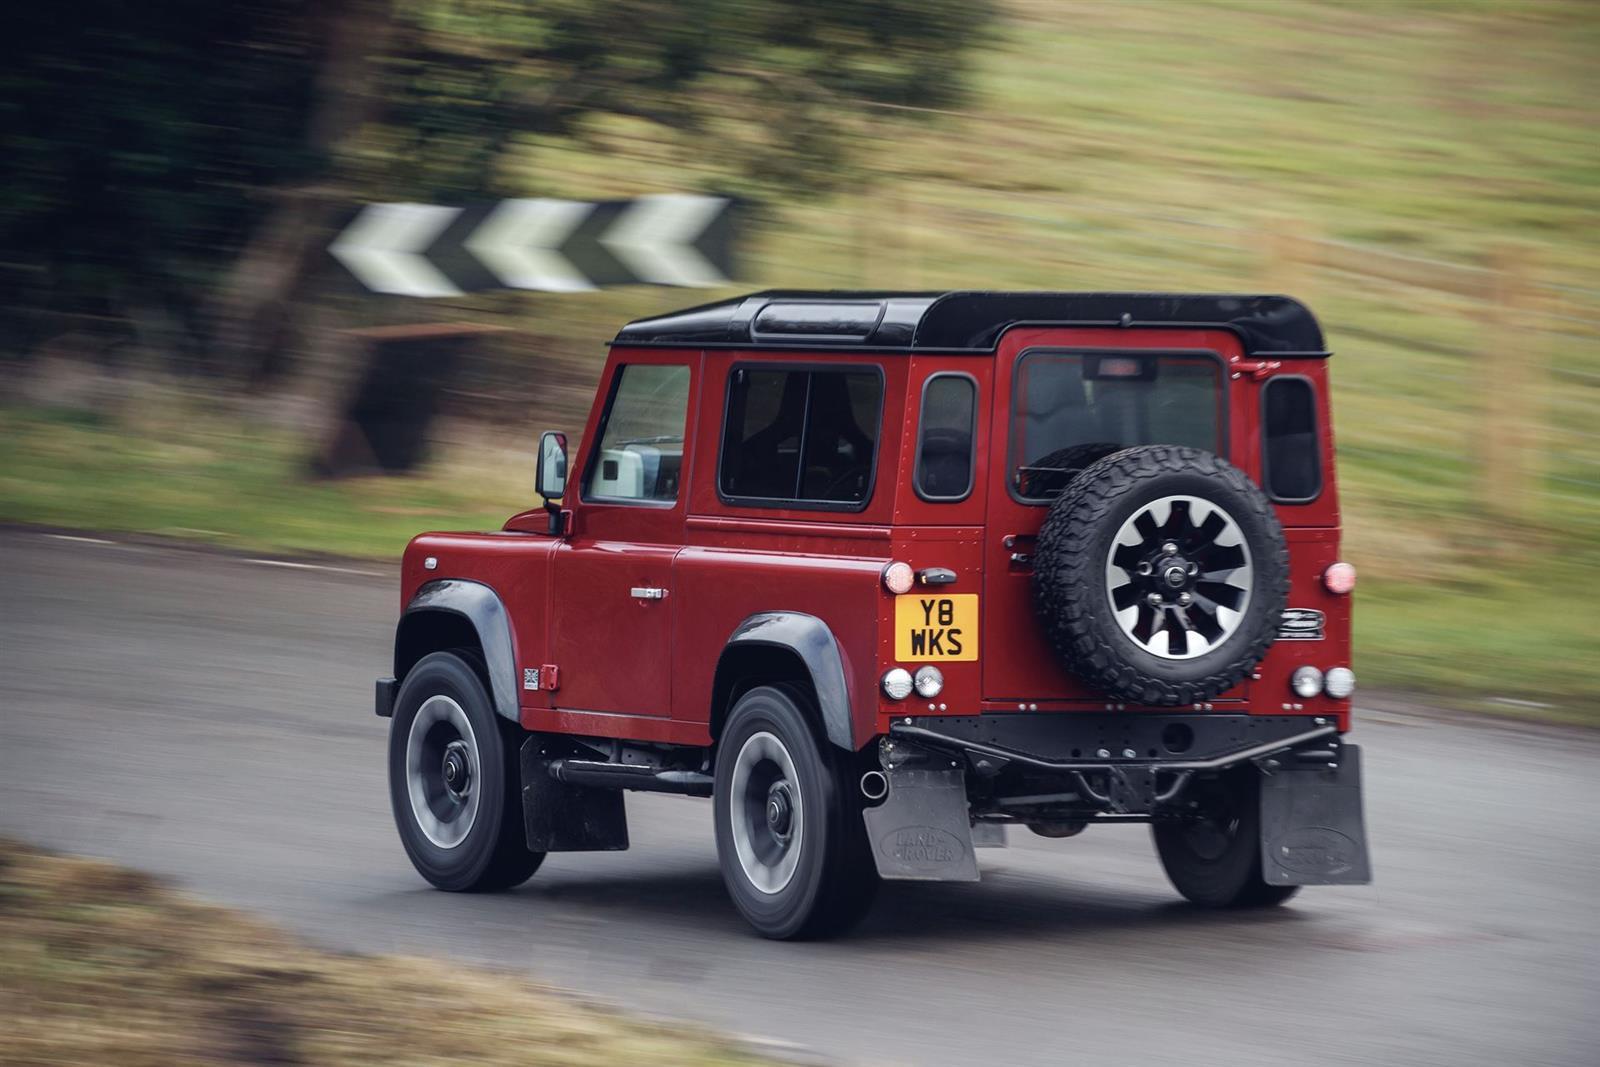 2018 Land Rover Defender V8 Edition Image. https://www.conceptcarz